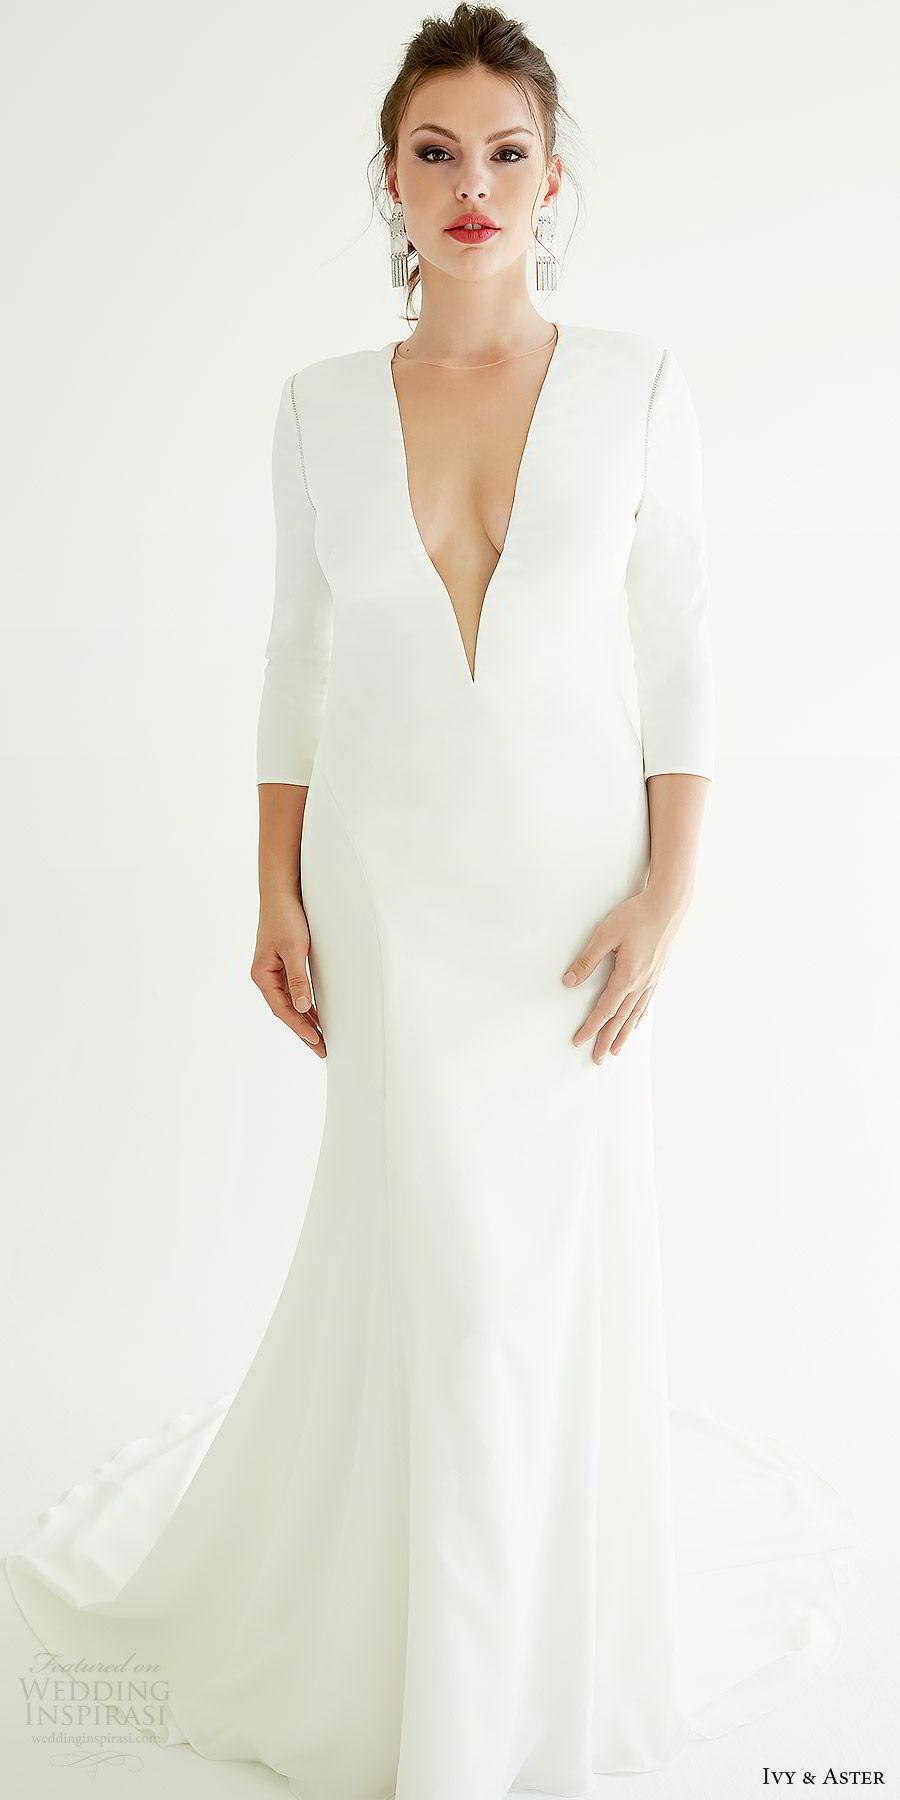 ivy aster bridal 2019 3 quarter sleeve deep v neck minimal sheath wedding dress (graham) mv sweep train elegant clean modern